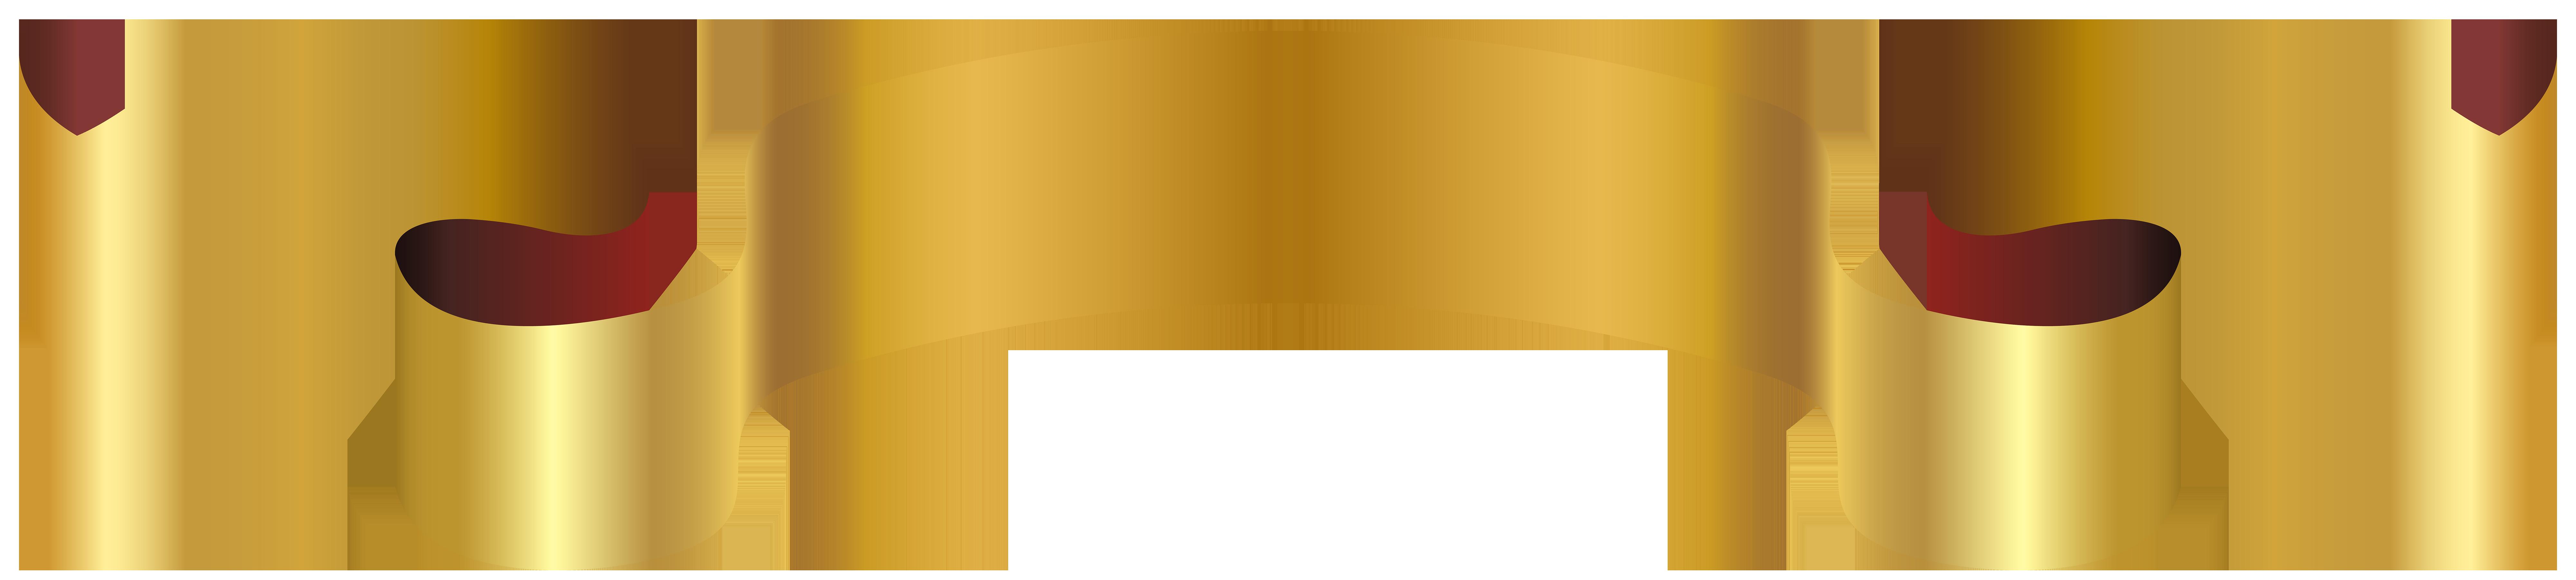 Luxury Golden Banner PNG Clip Art Image.